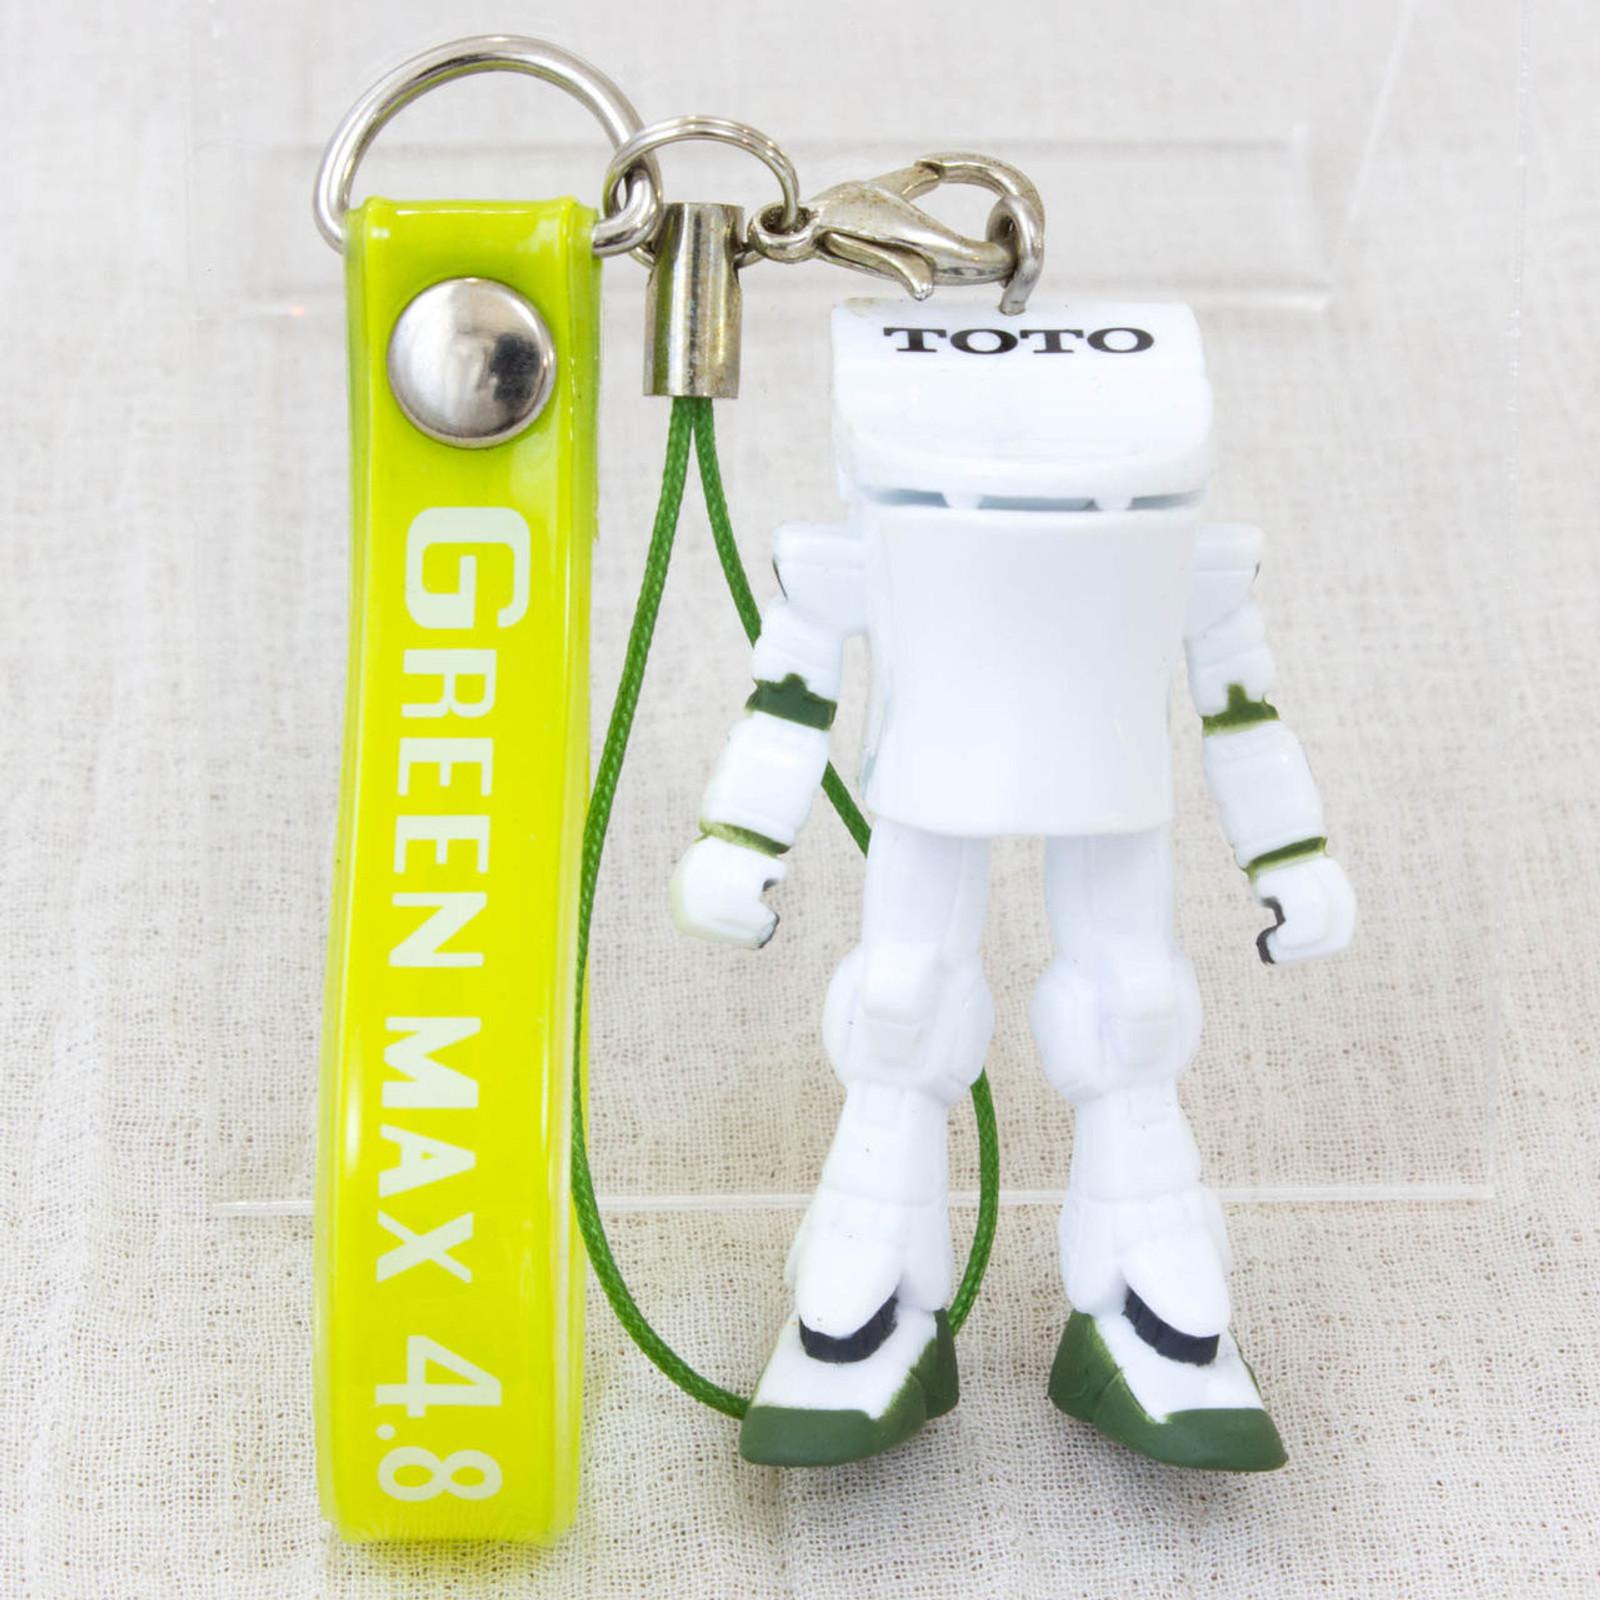 RARE! TOTO Green Max 4.8 Toilet bowl Green Mascot Figure Strap JAPAN ANIME